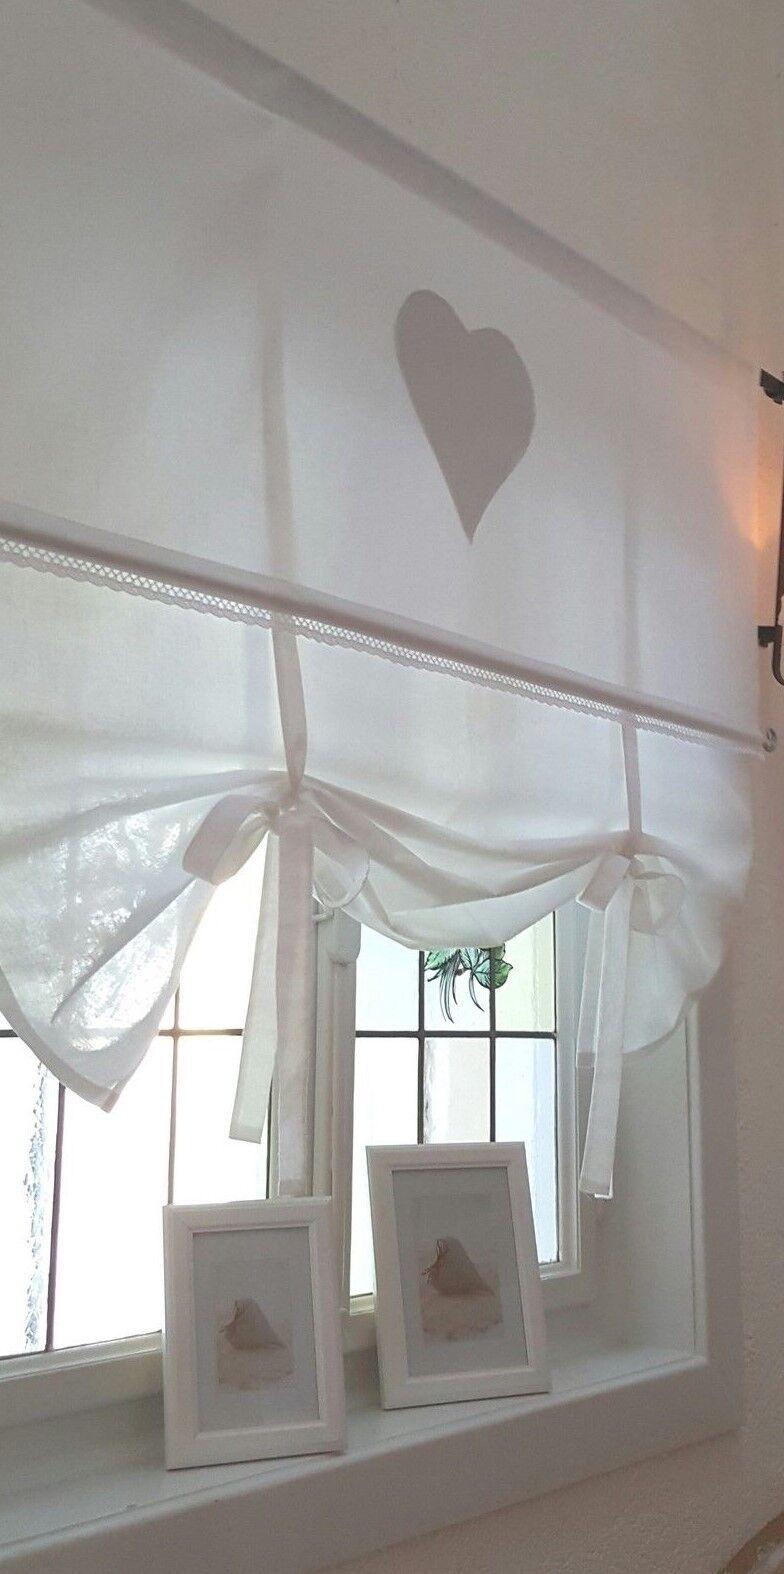 gardine raffrollo wei 80100120140155 x 100 cm lang. Black Bedroom Furniture Sets. Home Design Ideas